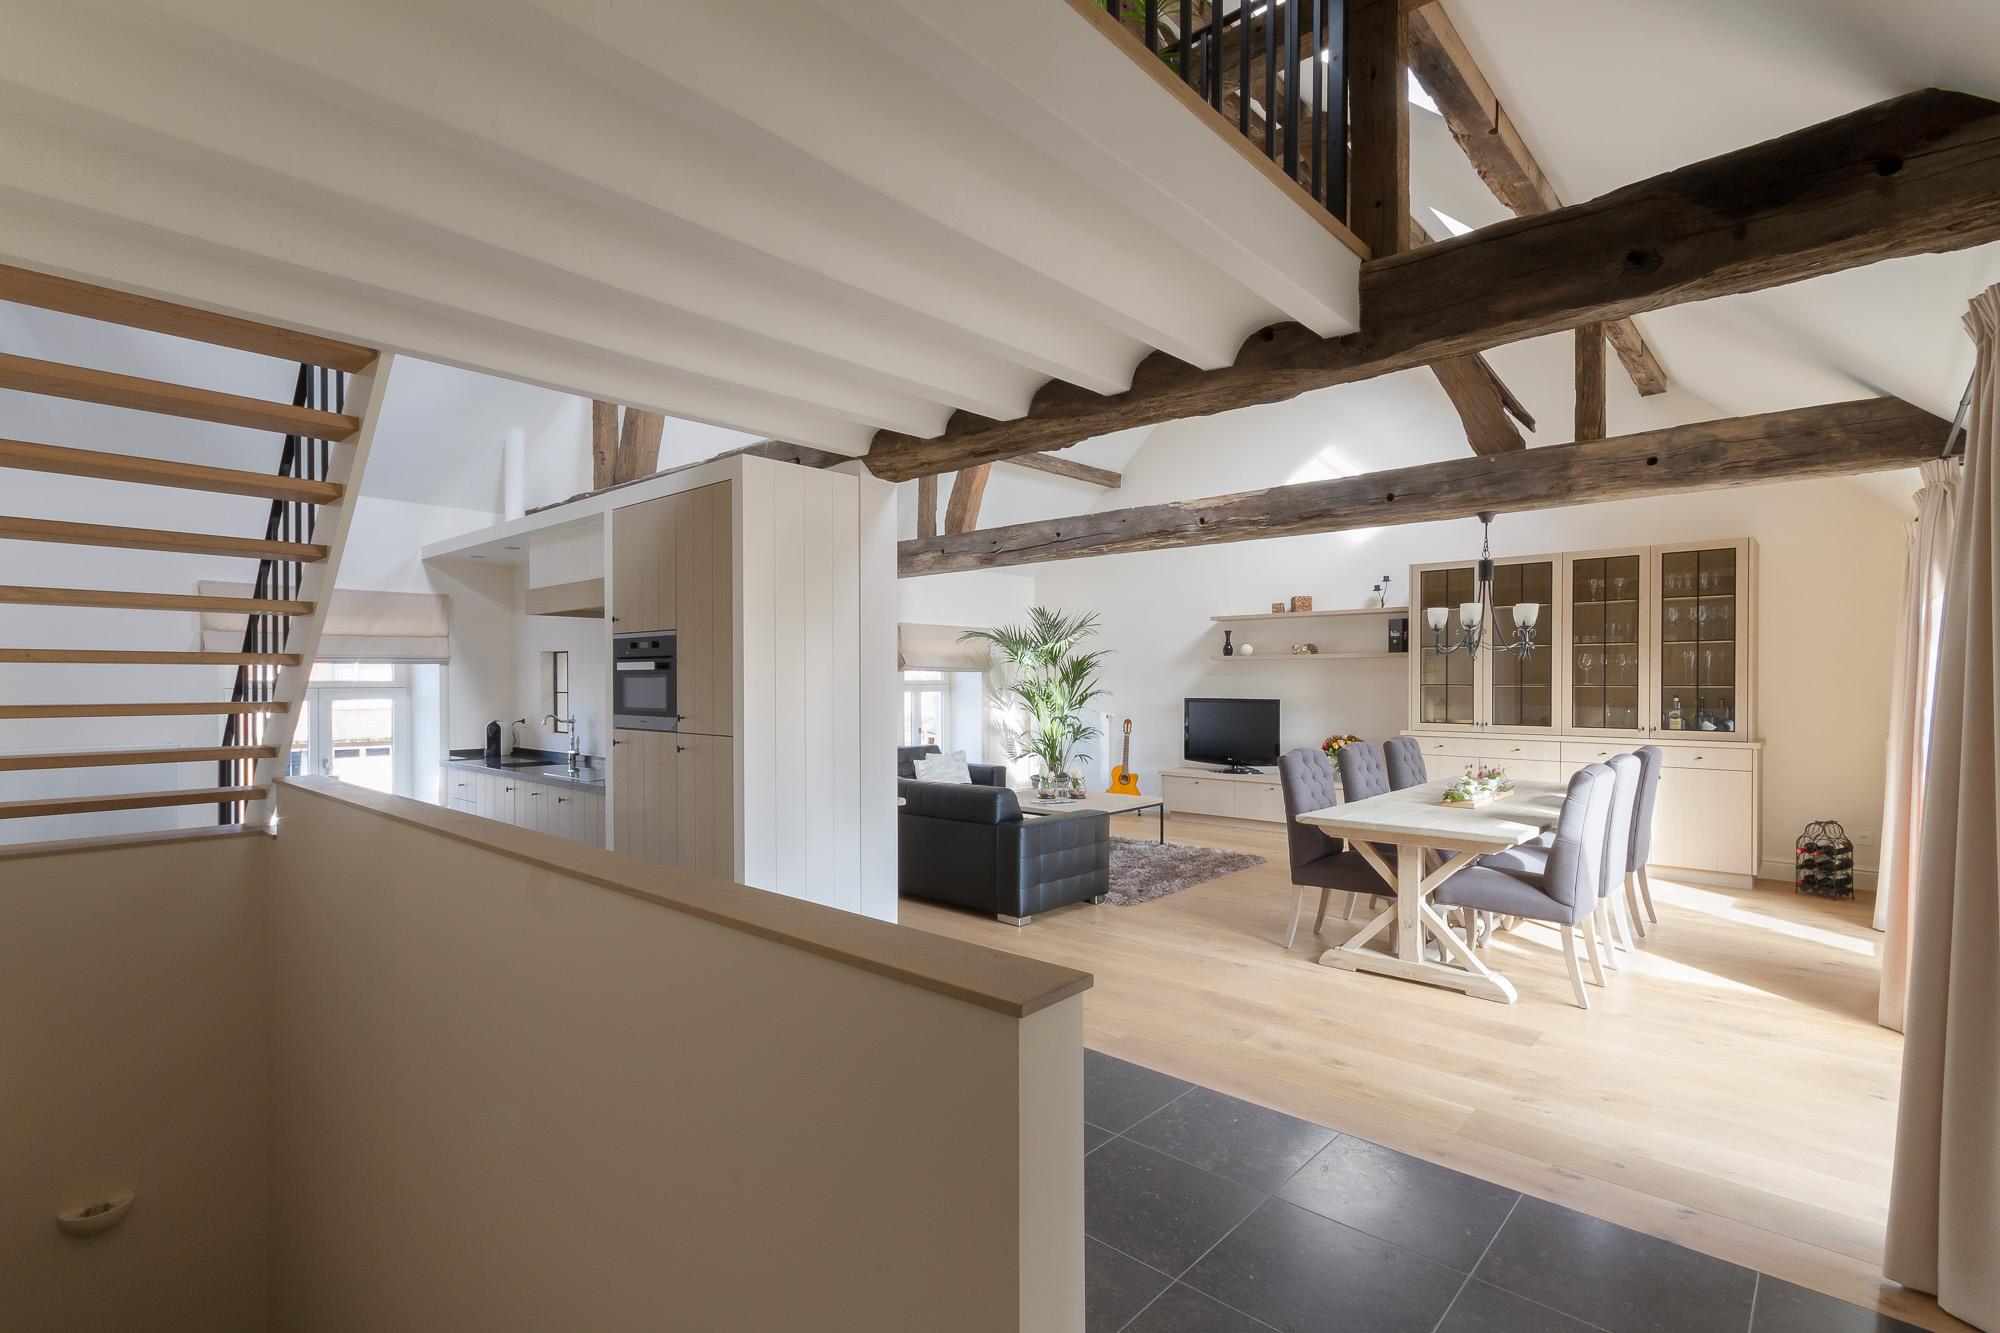 Appartement for Interieur plus peer